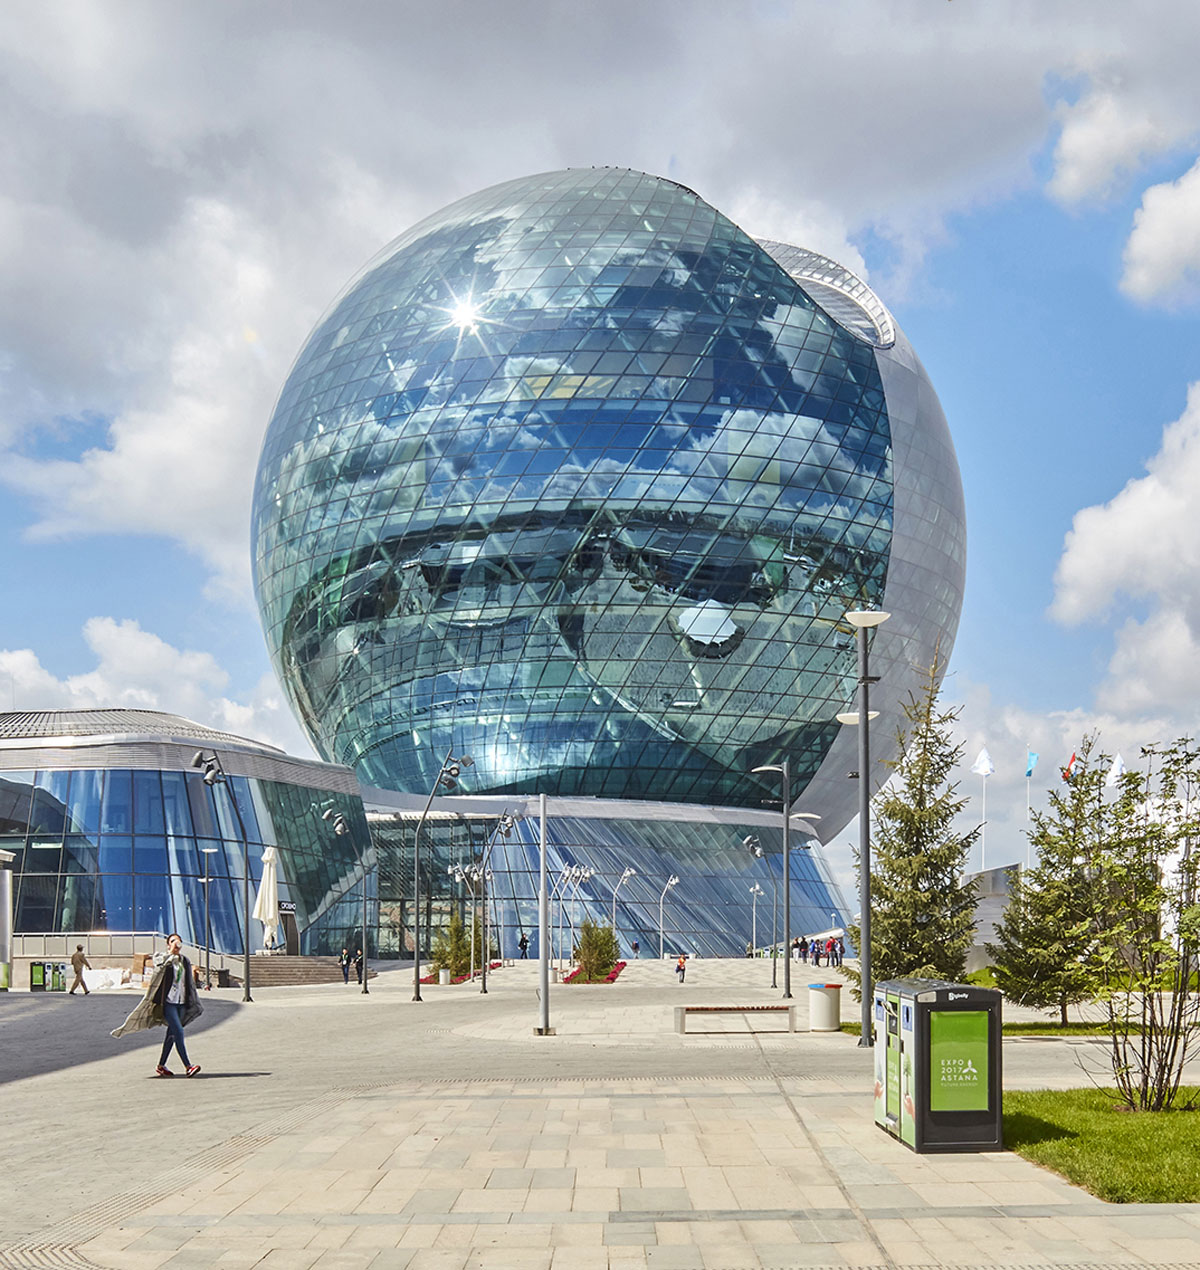 Expo 2017 astana kazakhstan expo 2017 astana kazakhstan - Dallas home and garden show 2017 ...